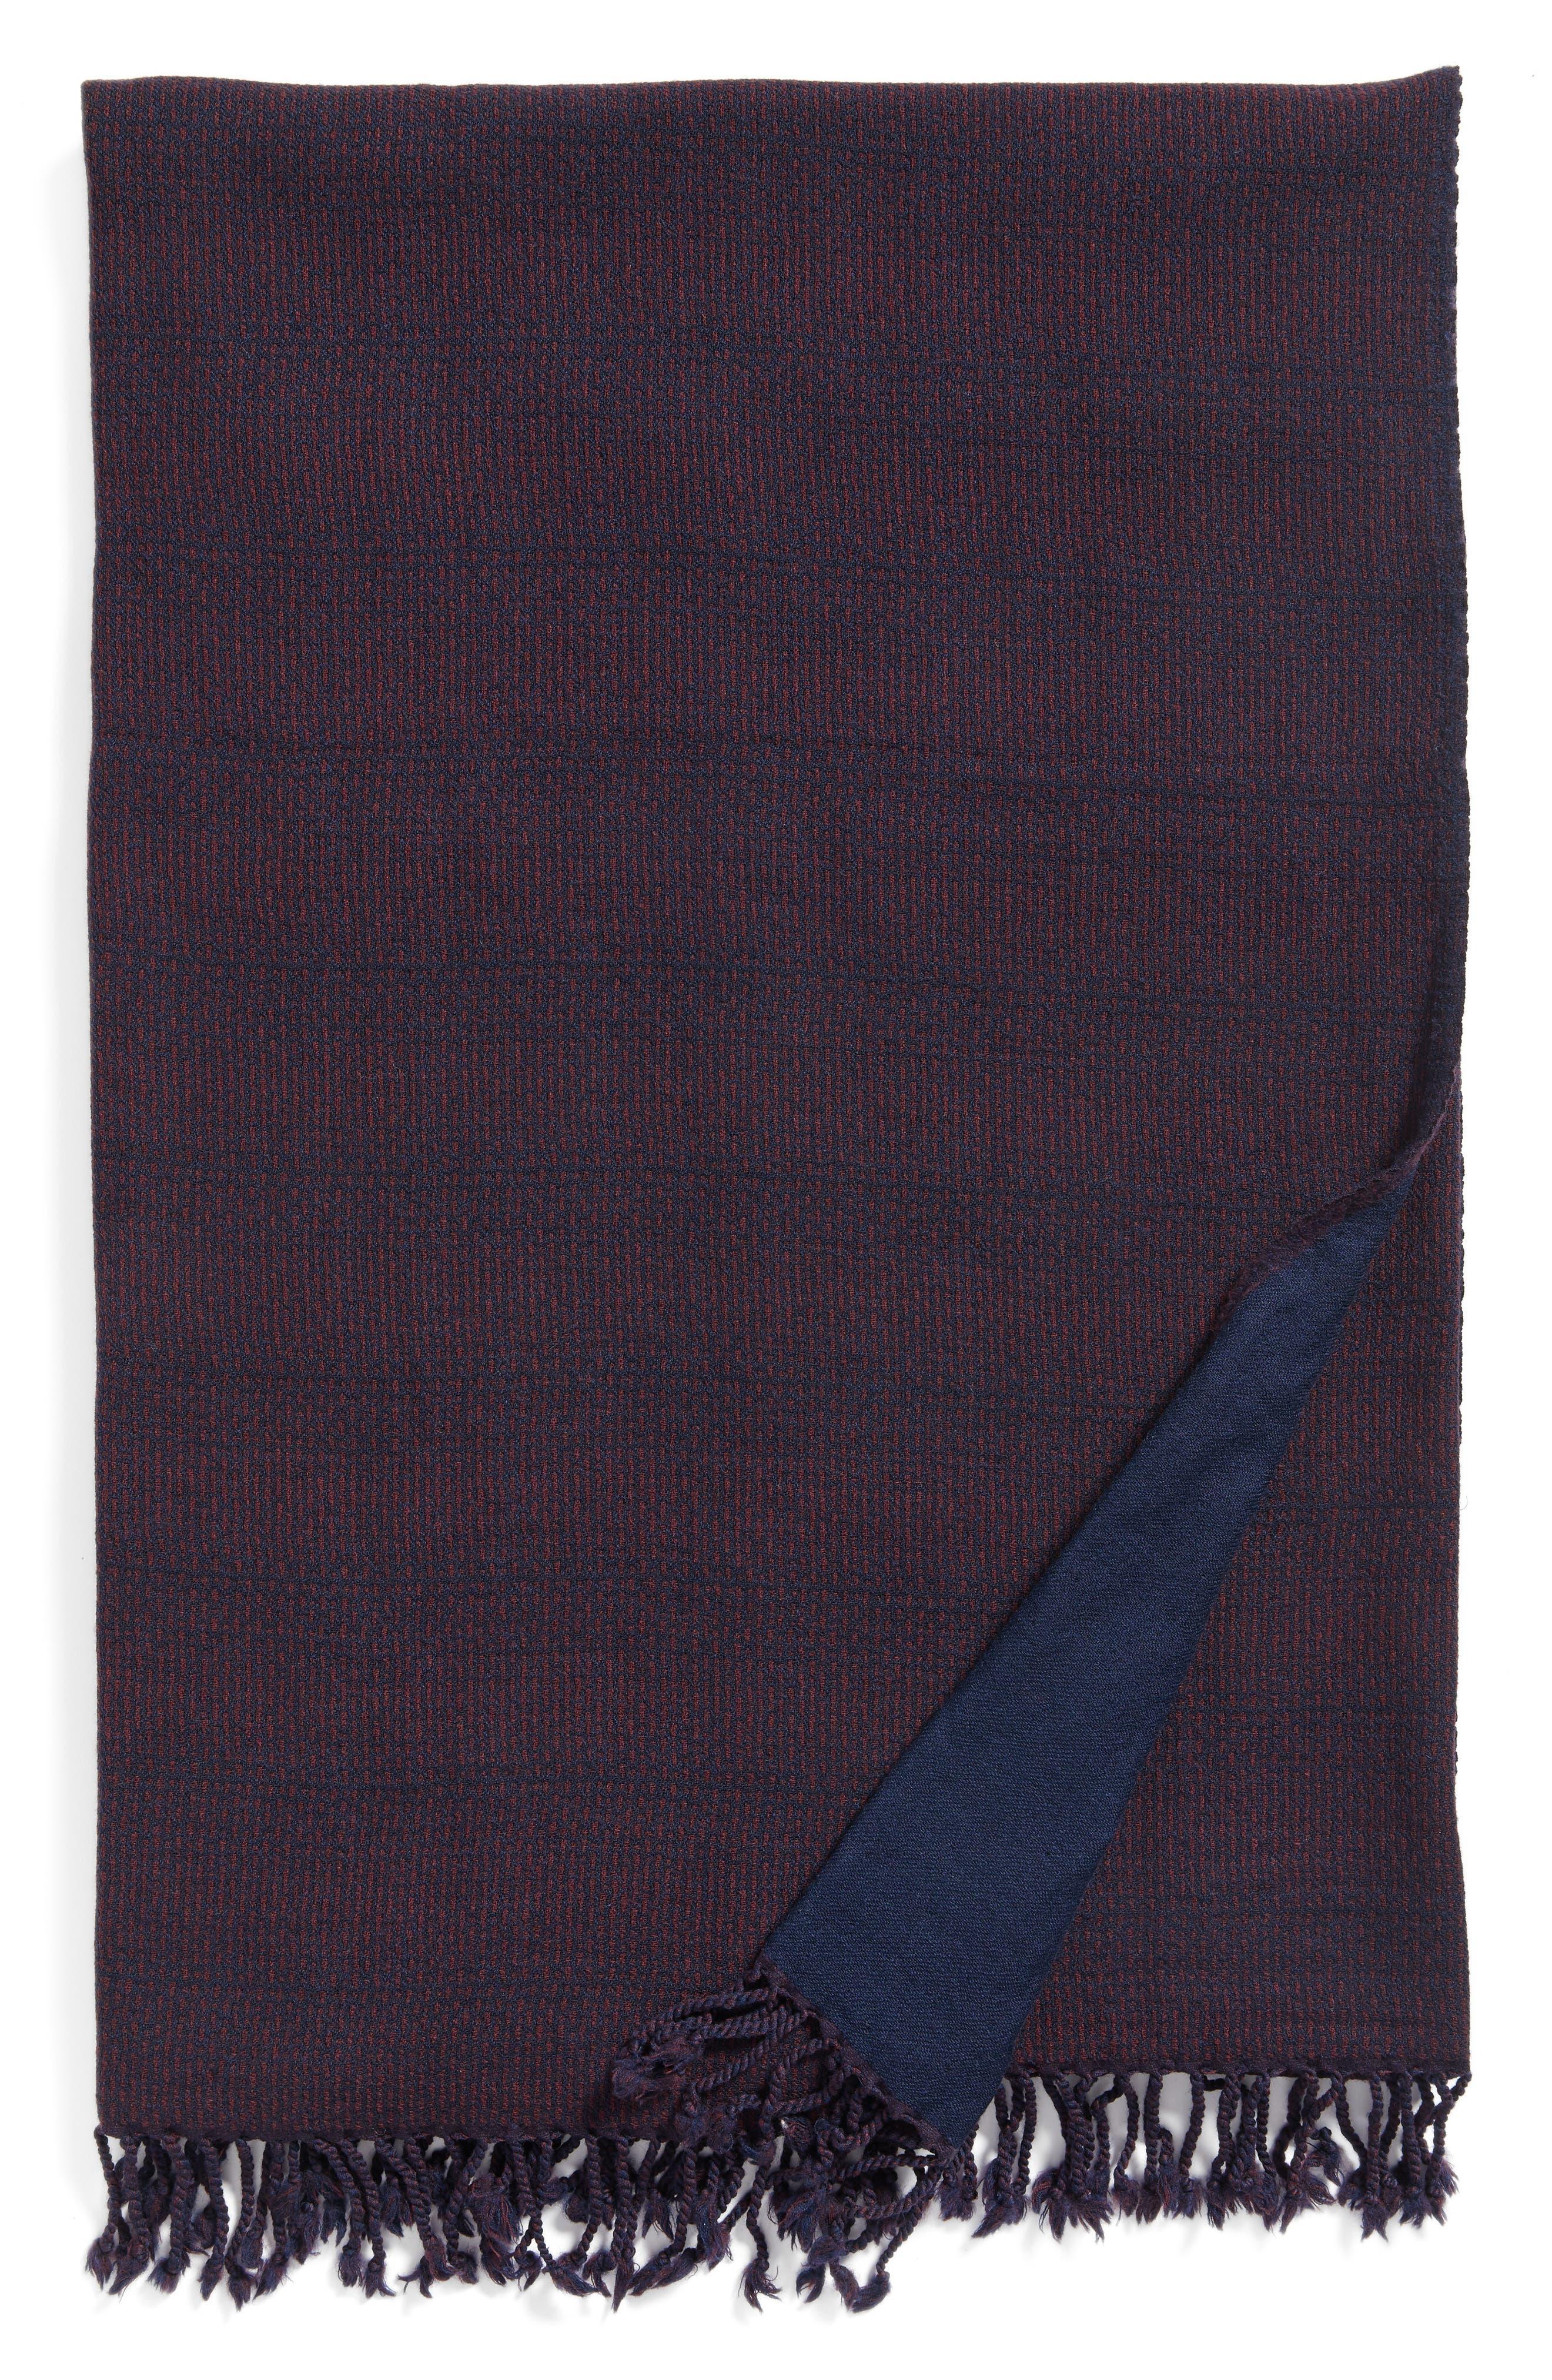 Main Image - Modern Staples Stipple Stripe Double Face Merino Wool Throw